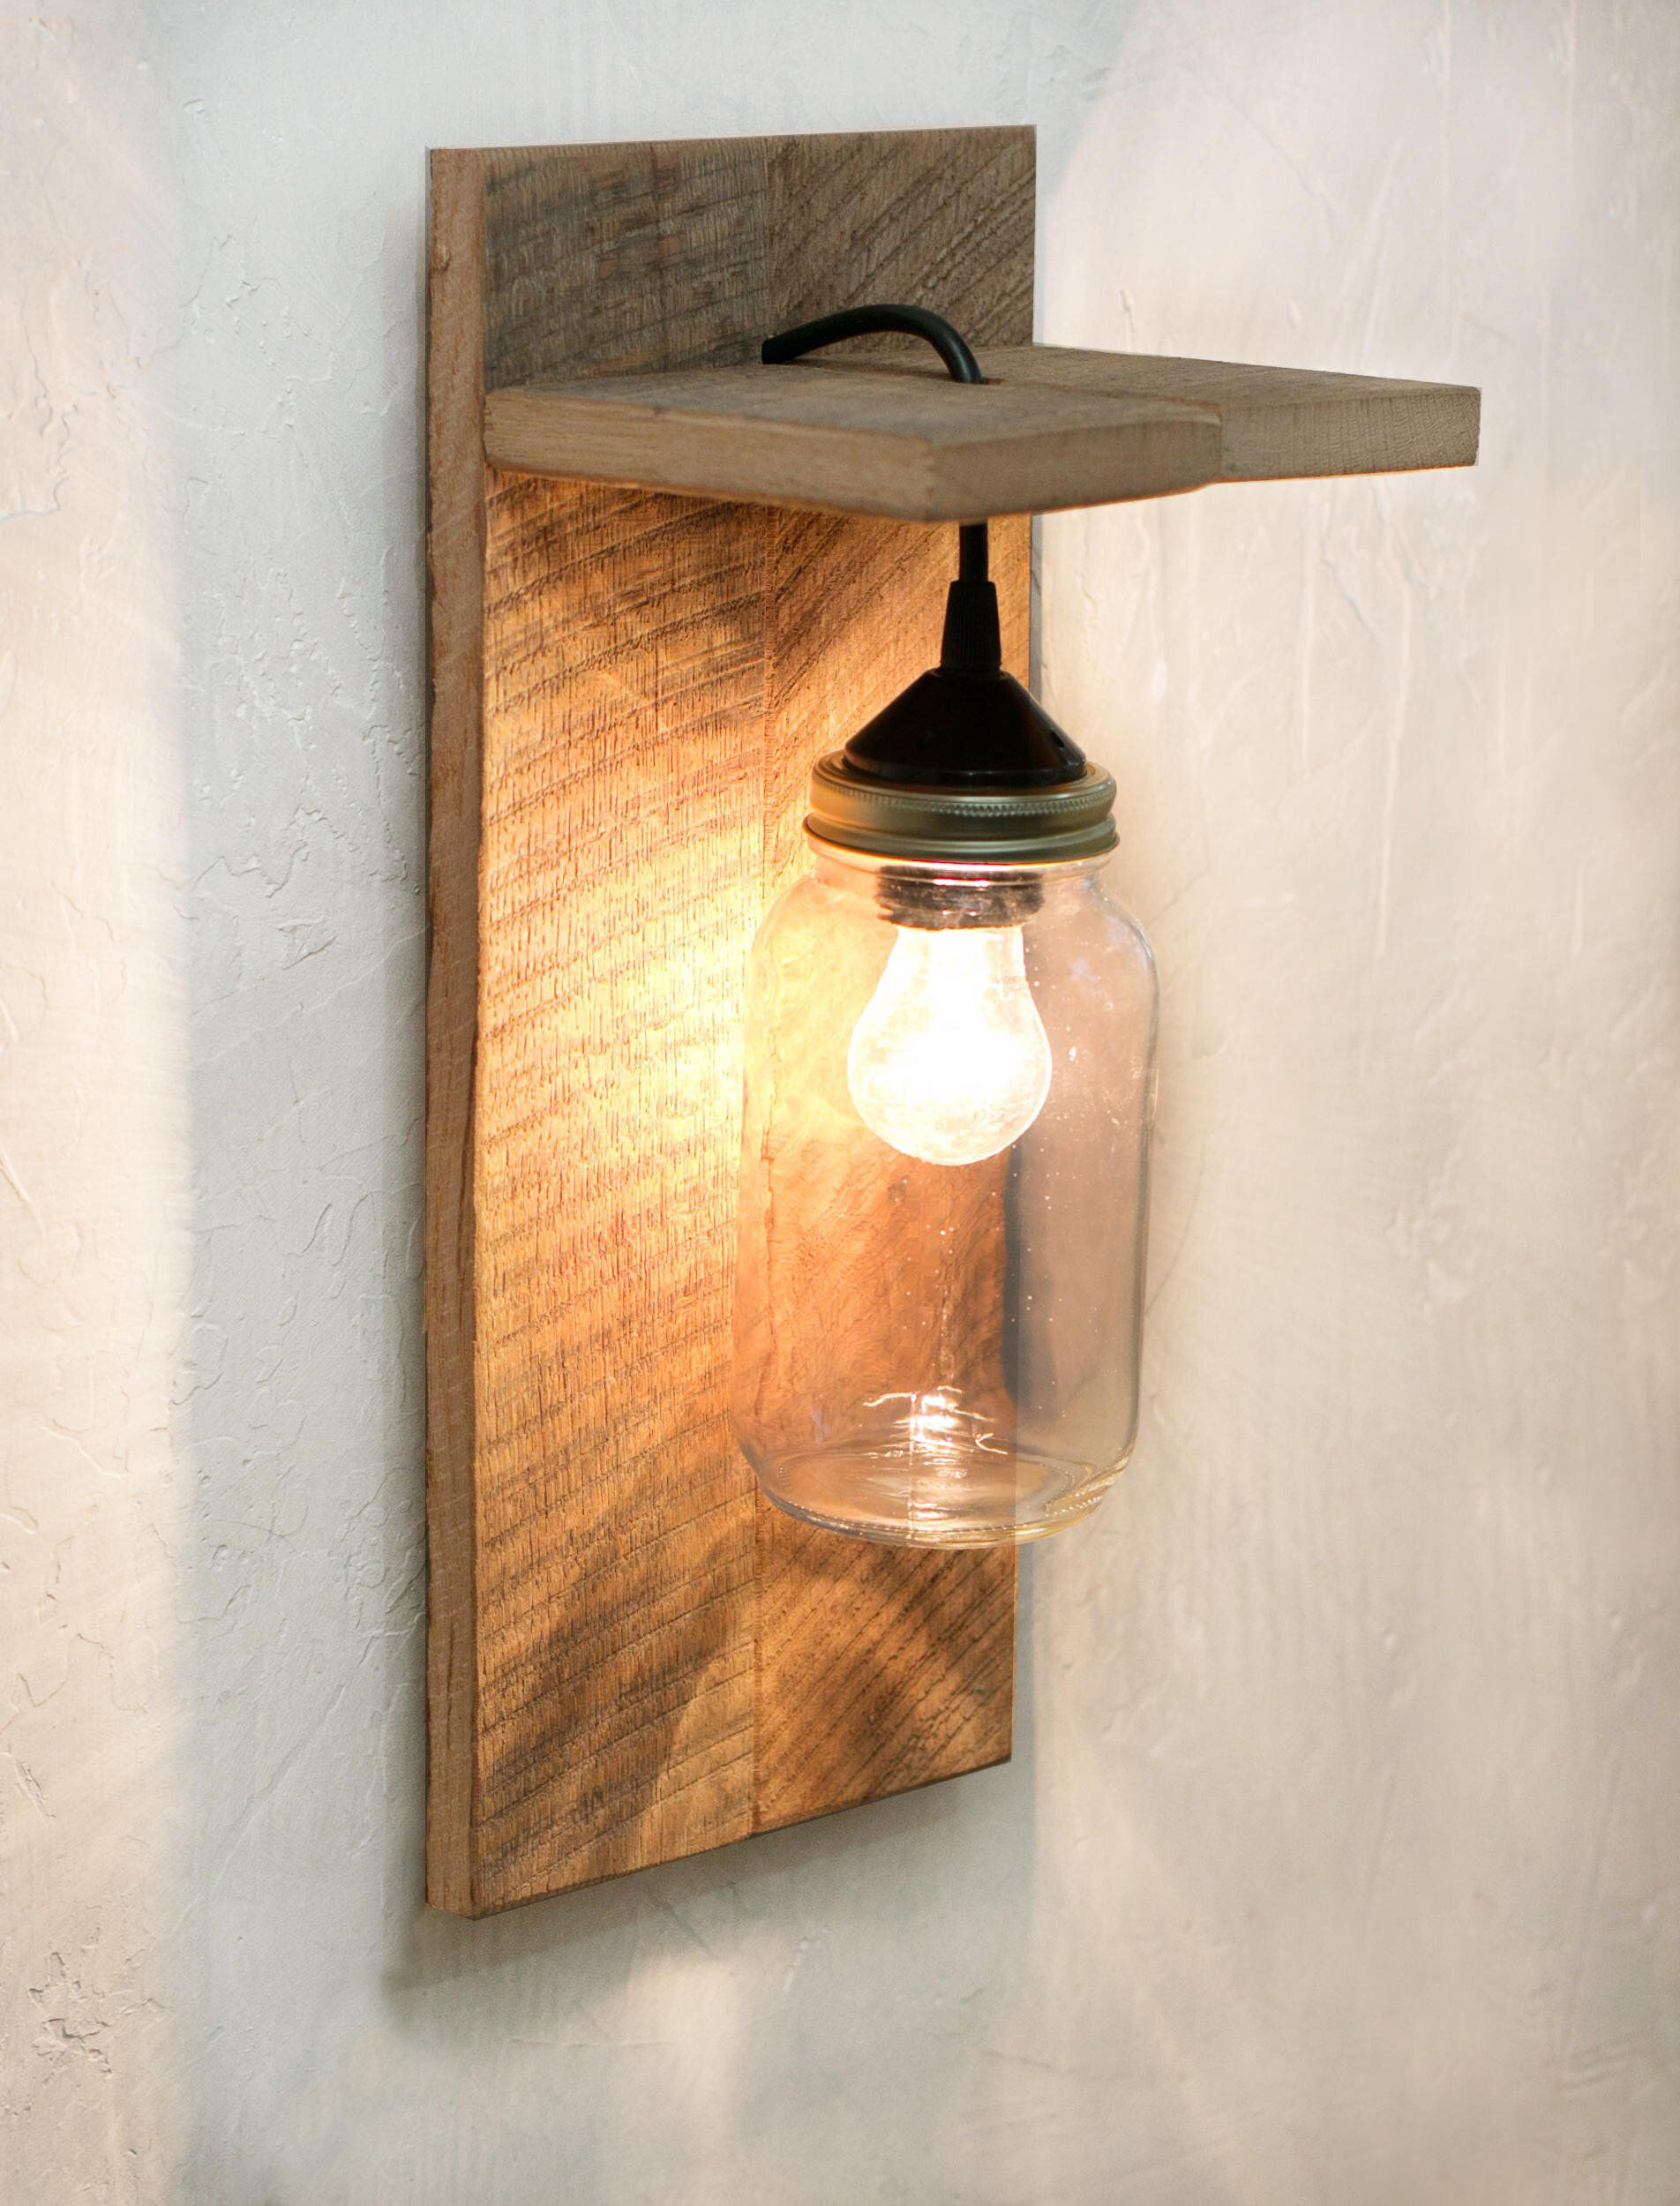 Mason Jar Light Fixture Reclaimed Wood Wall Sconce Wall Lamp Wall Mounted Light Rustic Deco Mason Jar Light Fixture Wood Wall Lamps Mason Jar Lighting